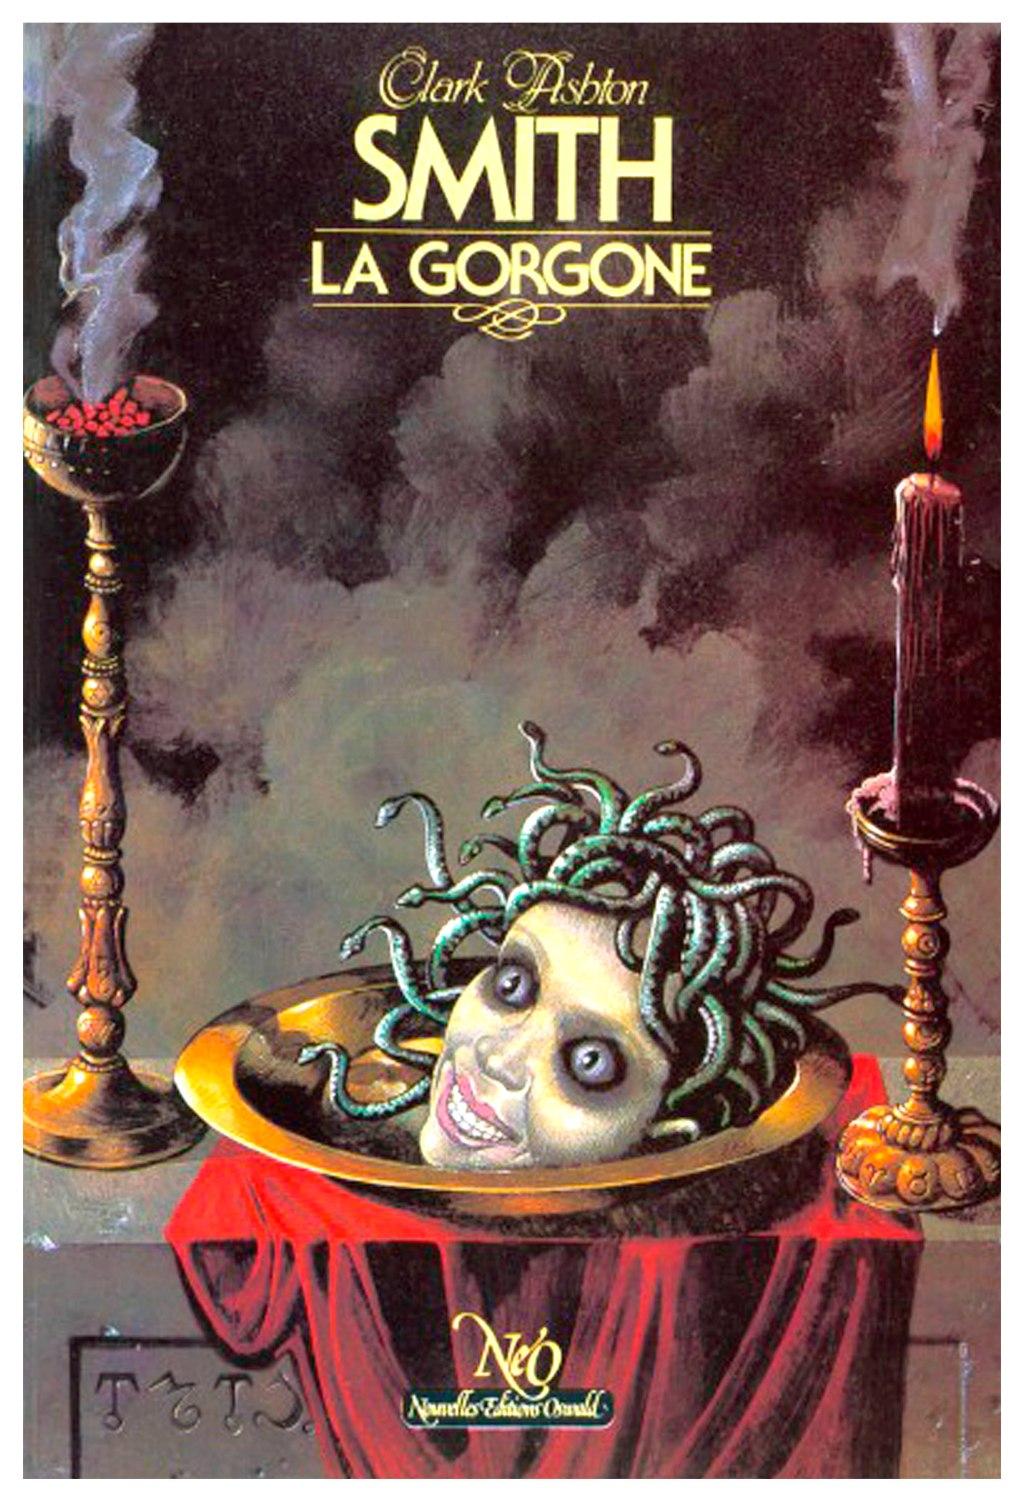 La Gorgone - NéO [1986] - Clark Ashton Smith